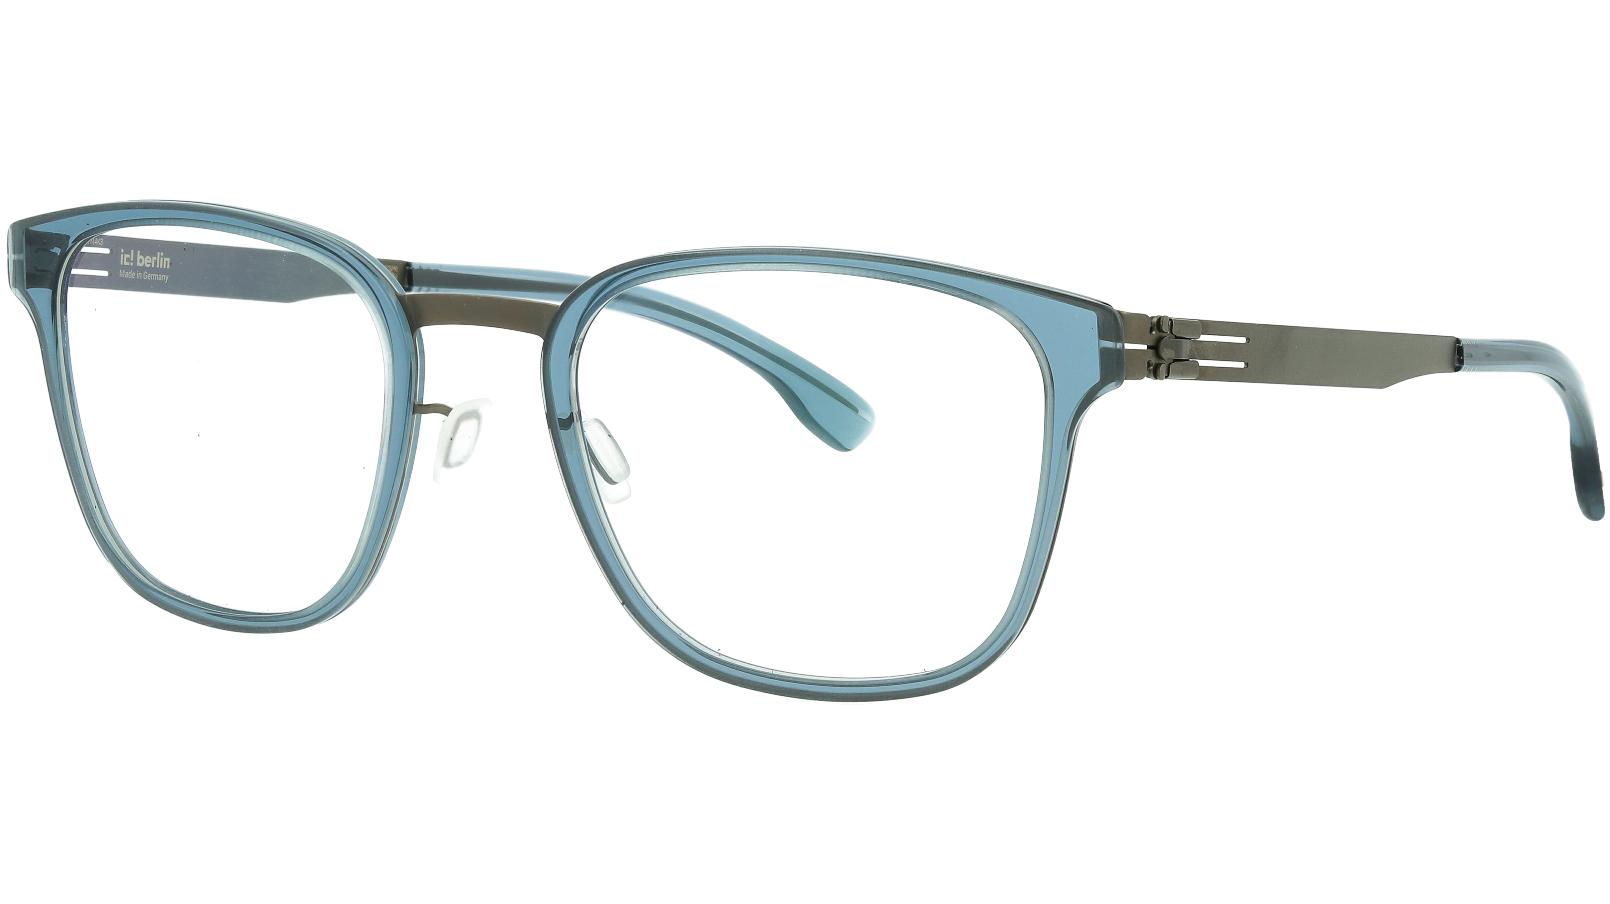 ic! Berlin Mr.Bice Petroleum-Graphite 52 Clear Glasses